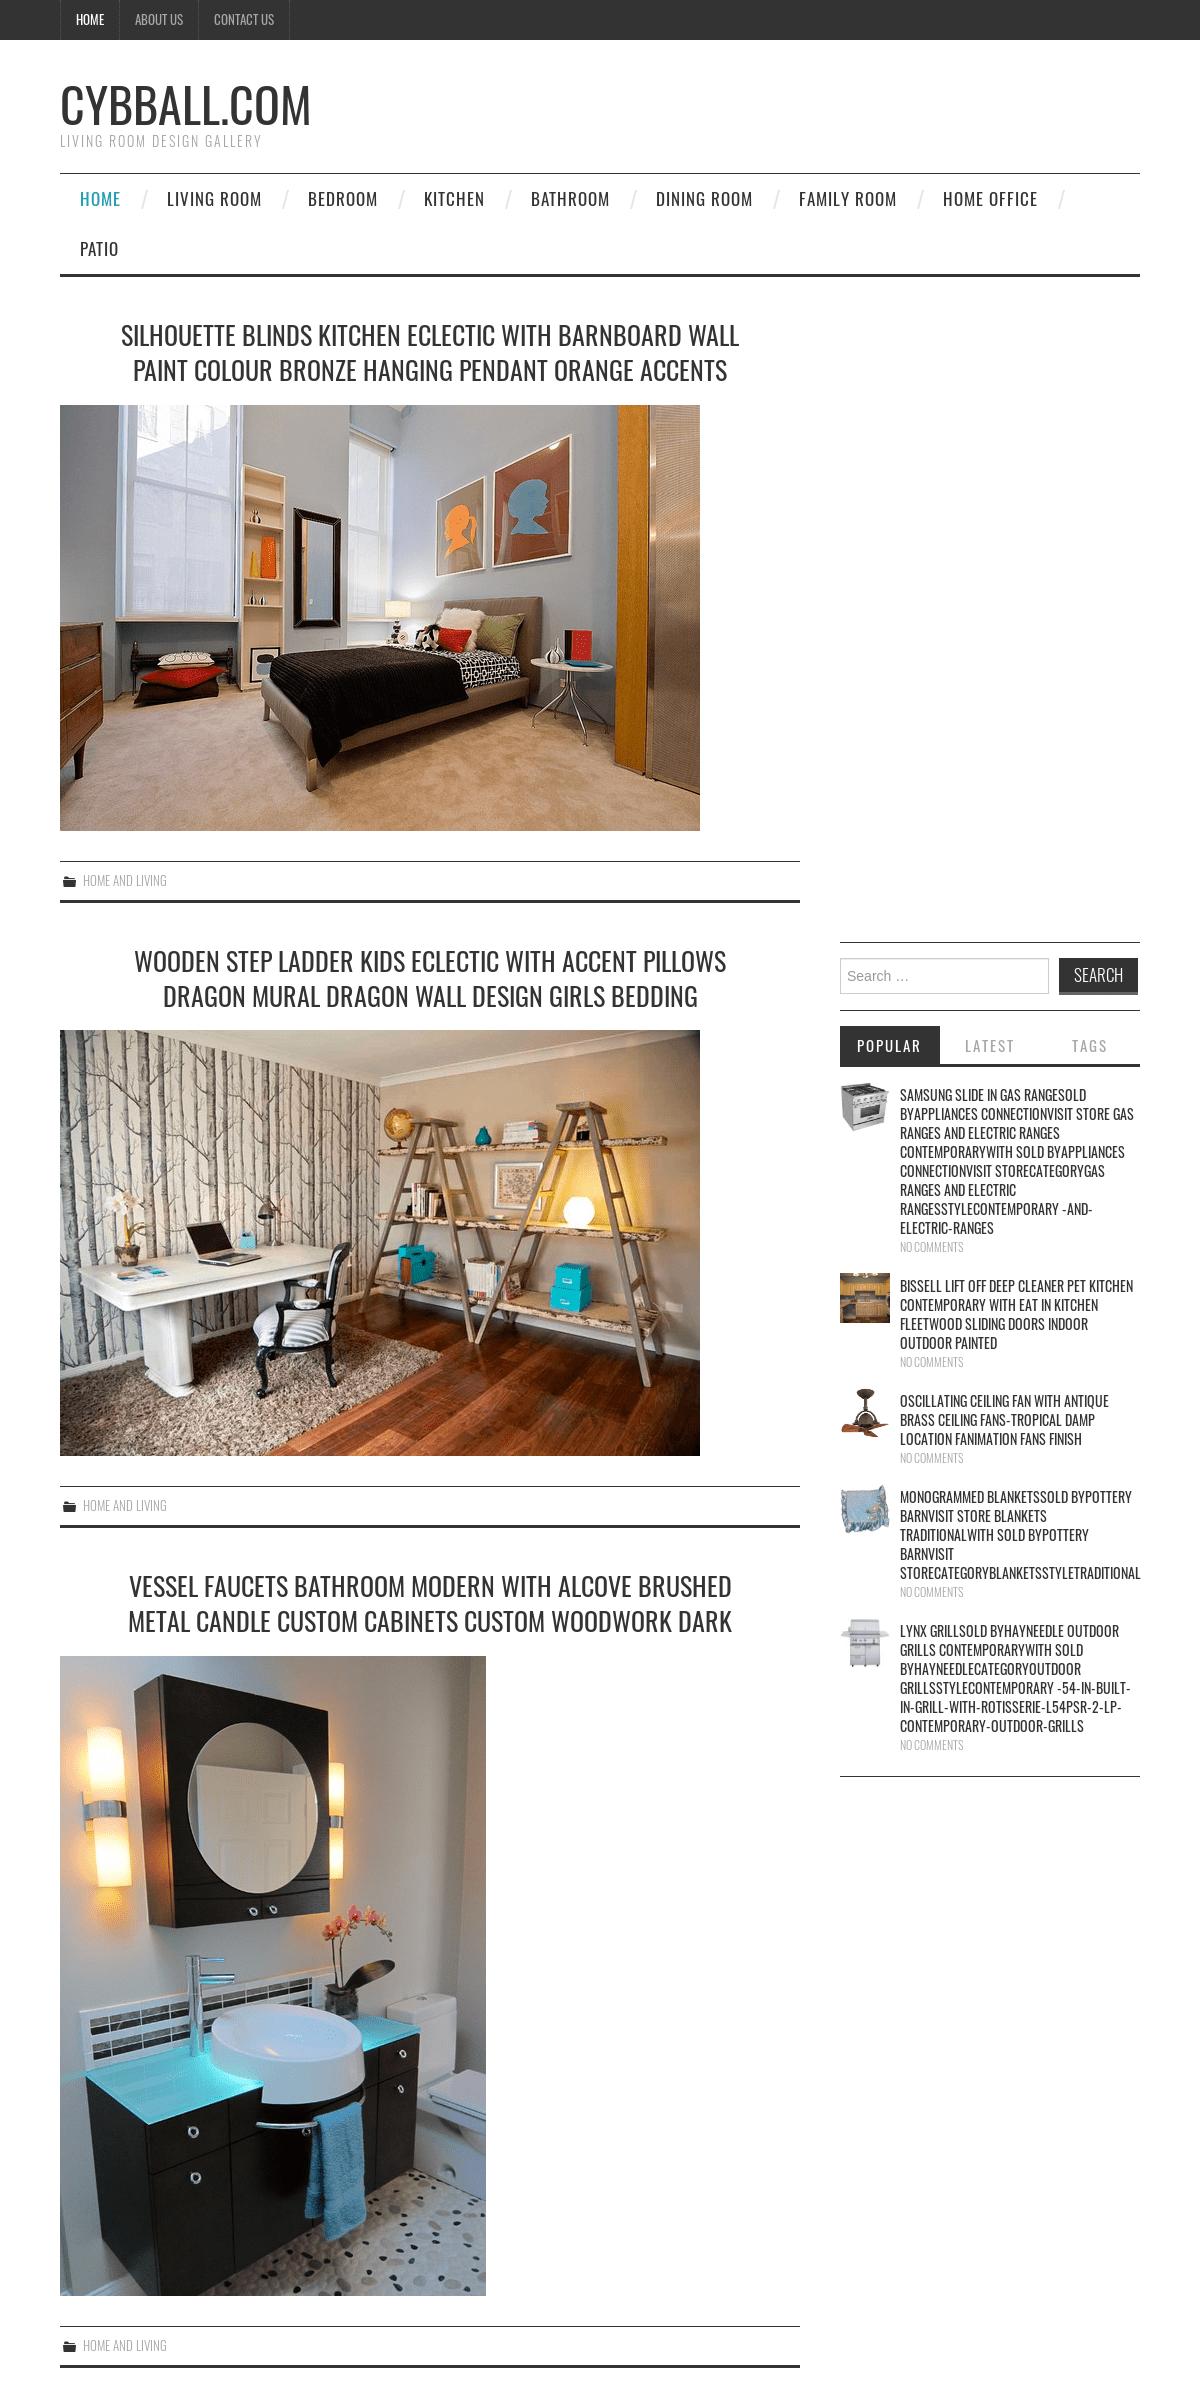 cybball.com - Living room Design Gallery